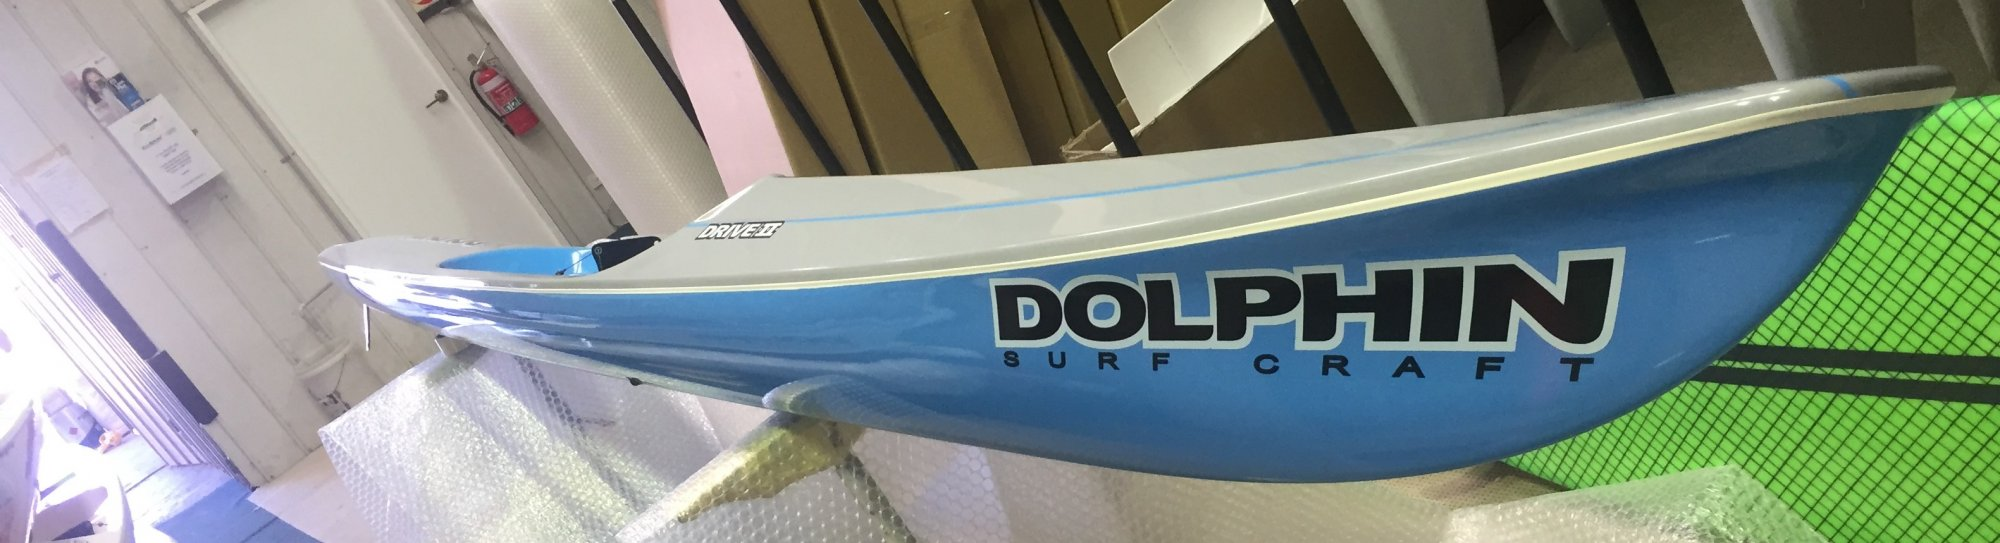 Dolphin Adjustable Drive II Surf Ski 19' - 1000